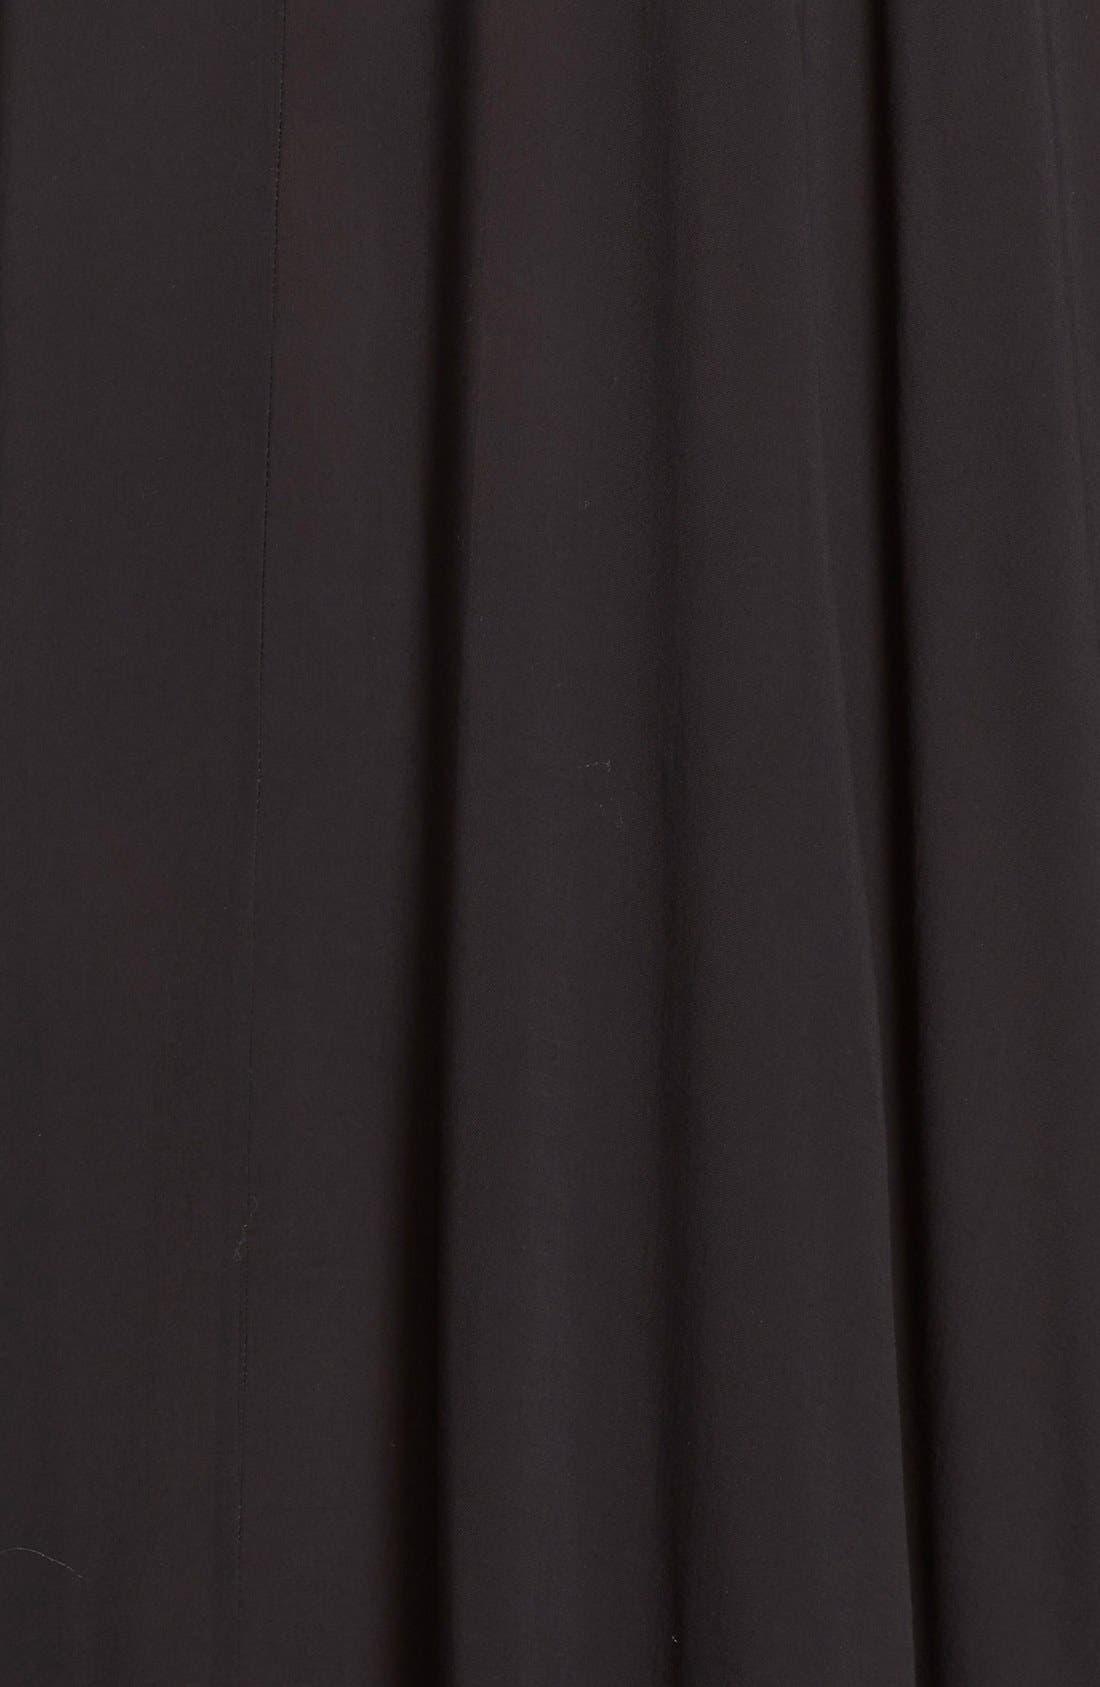 Cover-Up Maxi Dress,                             Alternate thumbnail 6, color,                             BLACK